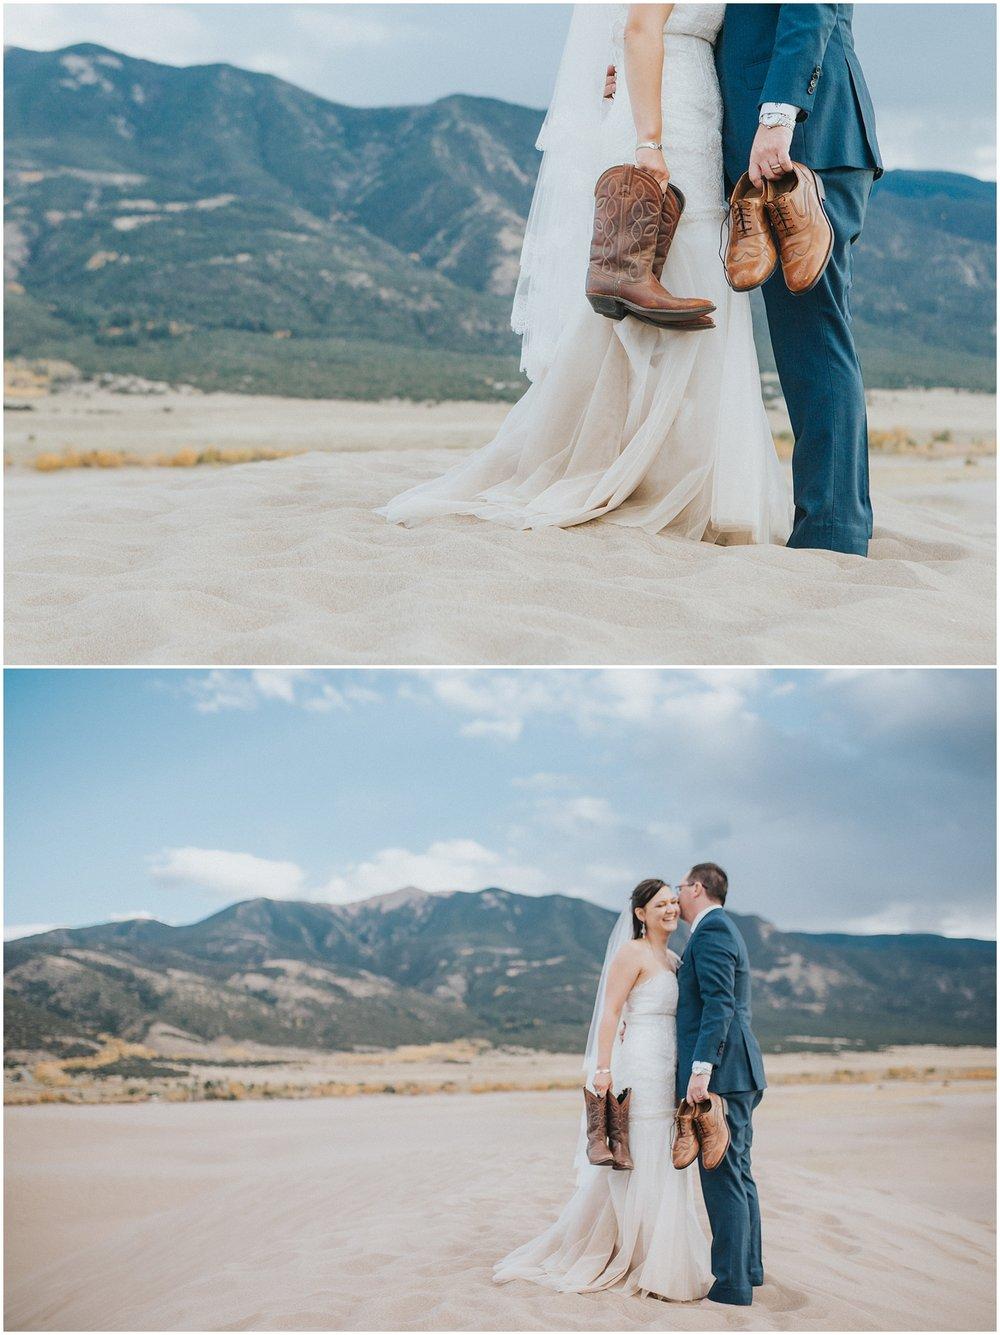 sand-dunes-national-park-wedding-photos_0002.jpg